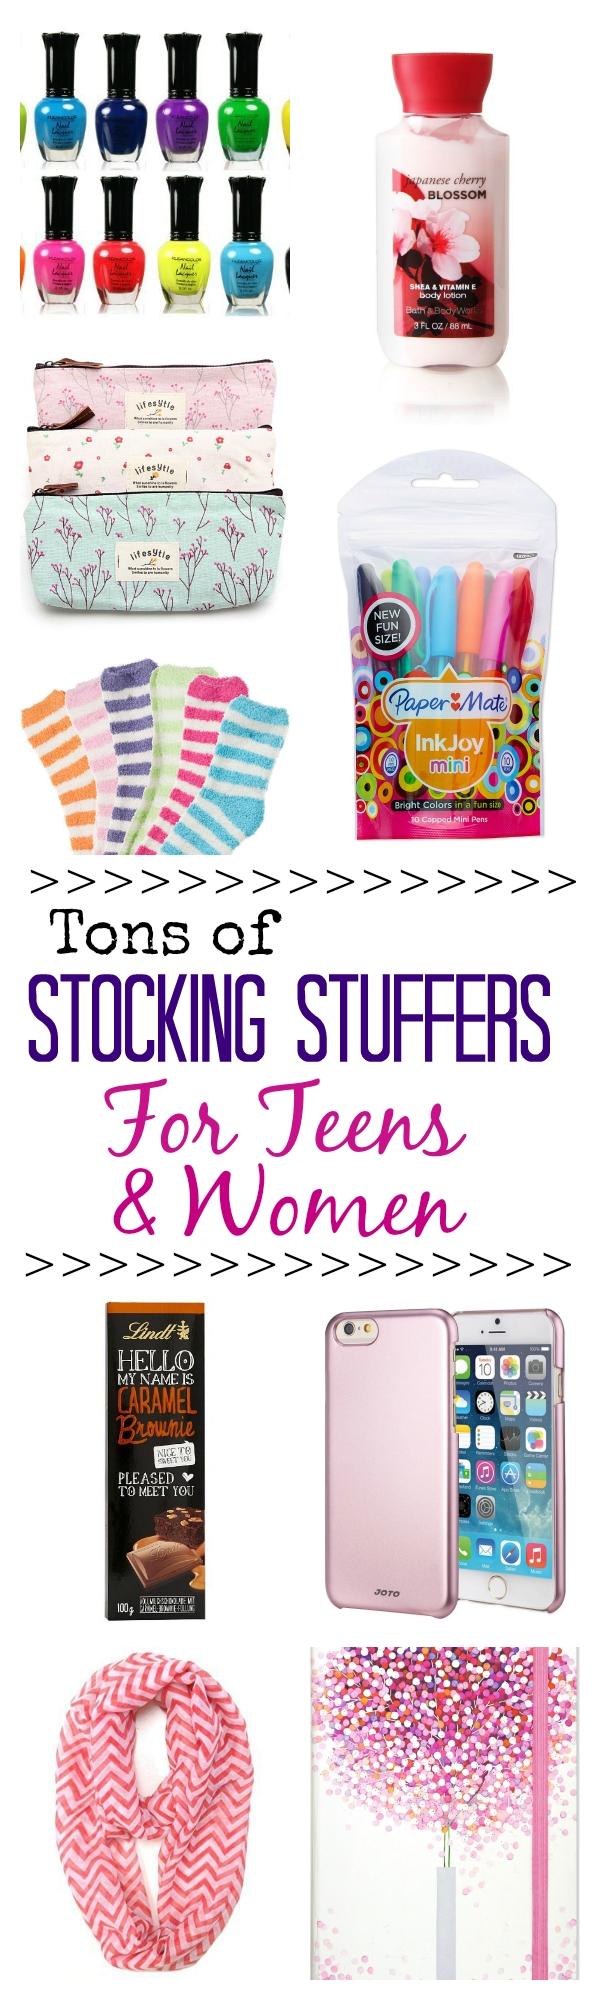 10 Spectacular Stocking Stuffer Ideas For Teenagers huge stocking stuffer ideas list crazy little projects 7 2020